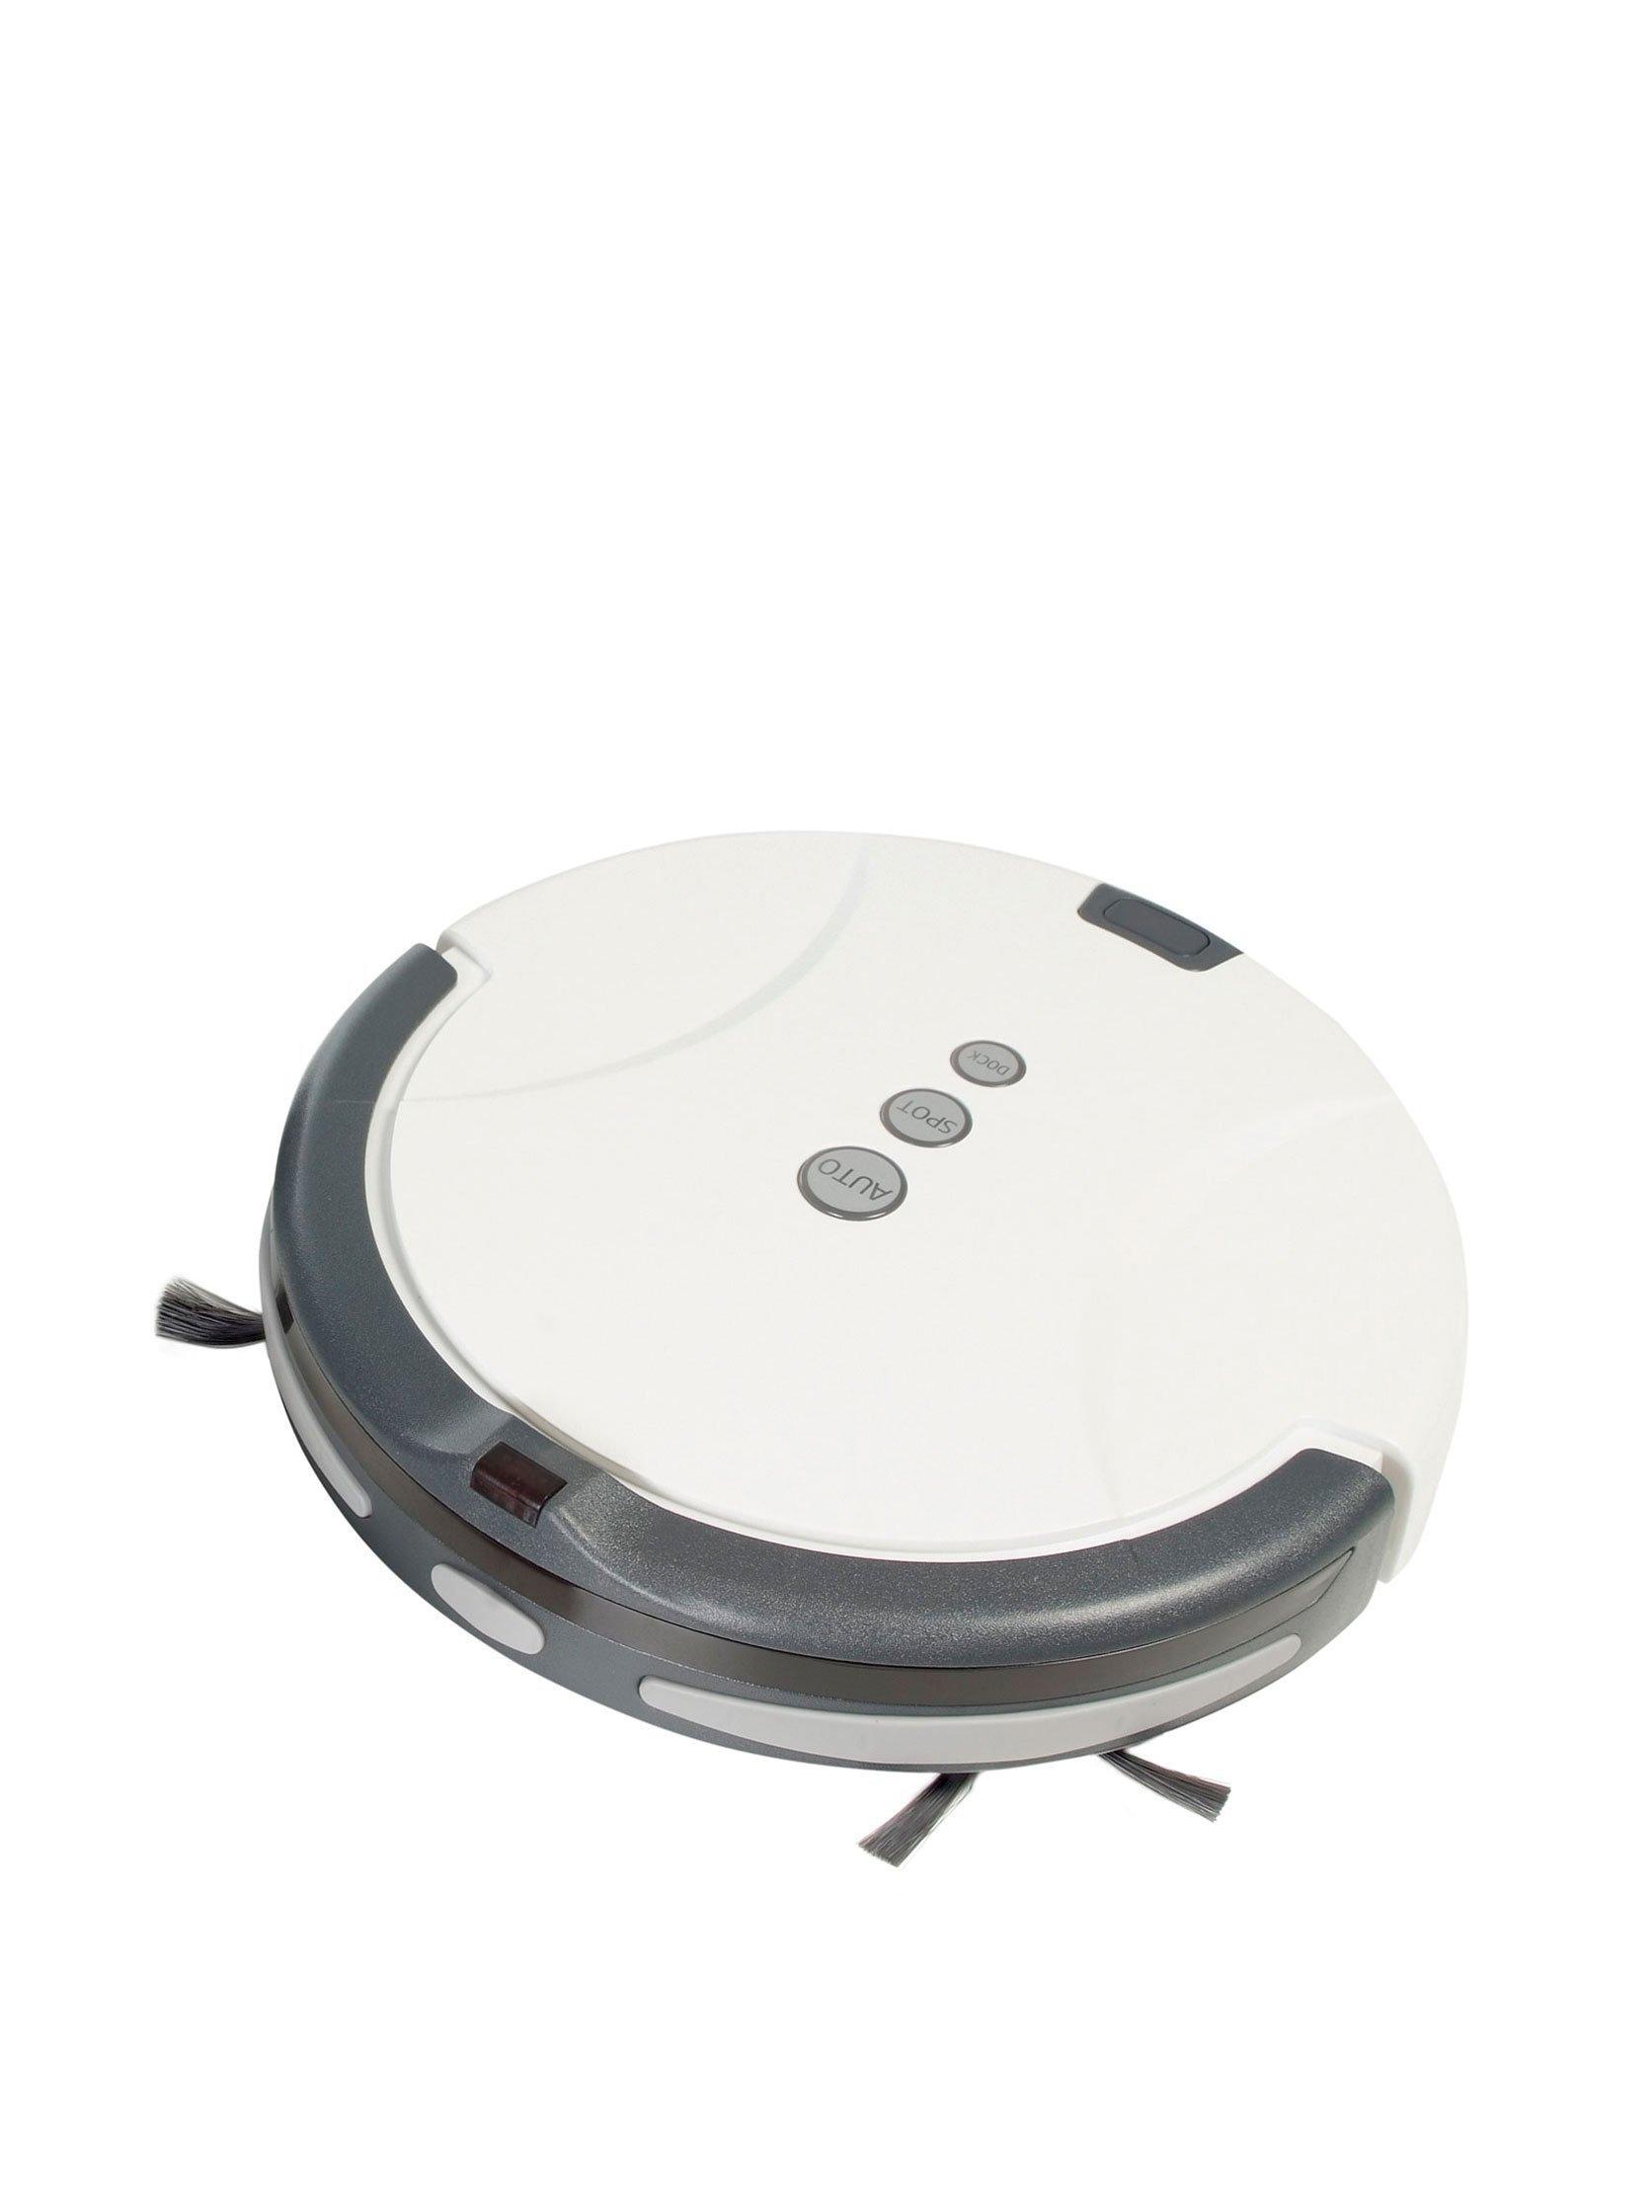 Tango Robot Aspirador Slim Plus: Amazon.es: Hogar